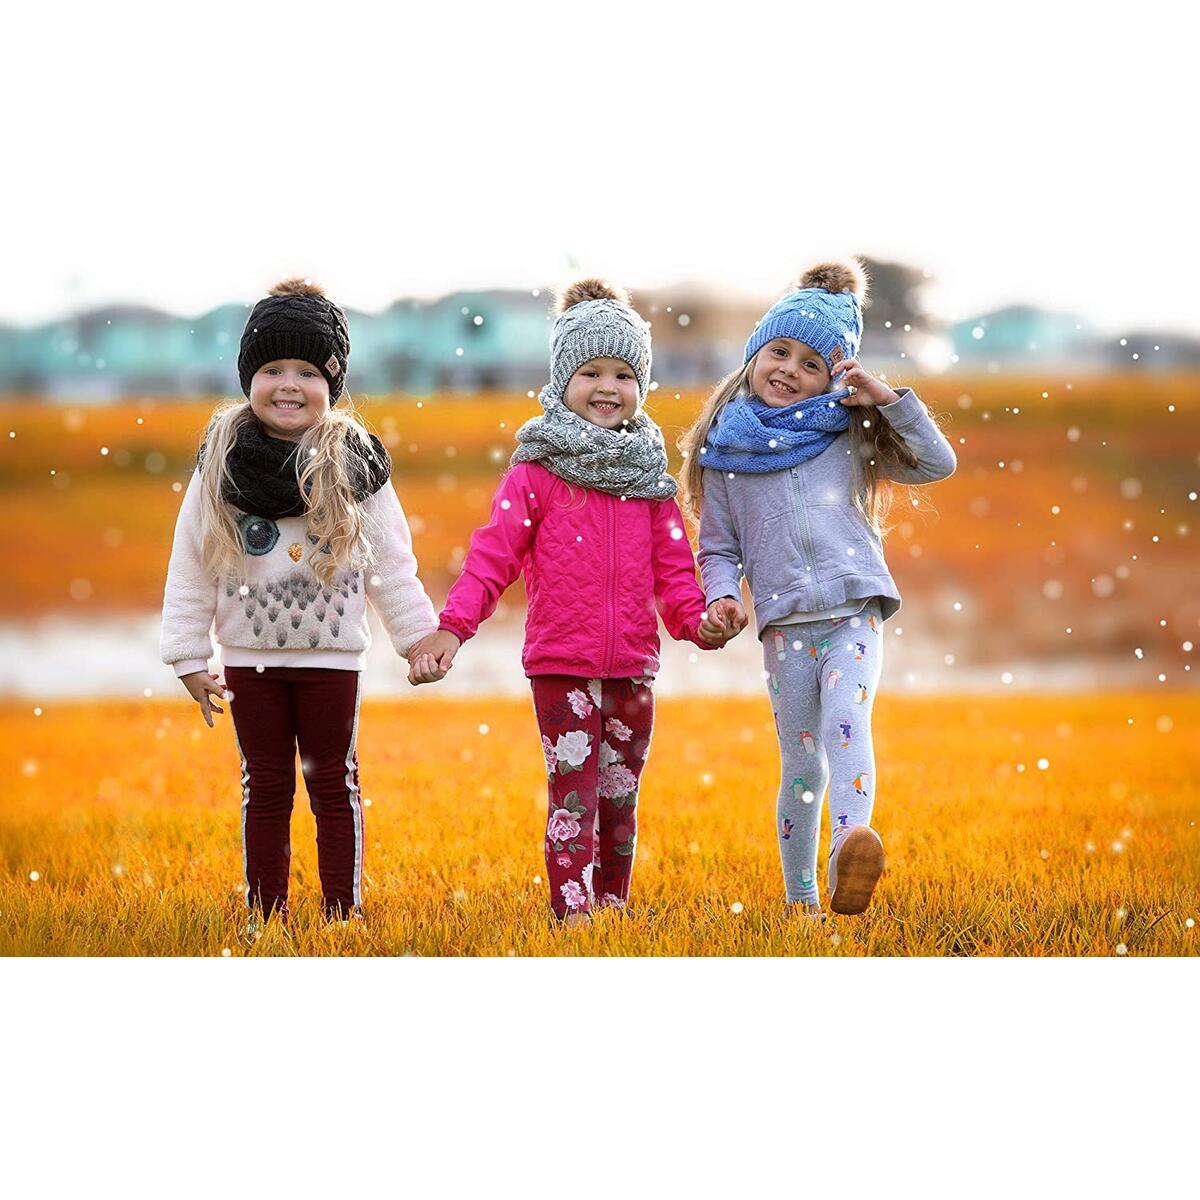 Kids Toddler Winter Hat Pom Beanie Infinity Scarf Set Warm Fleece Lined for Baby Girls Boys Grey/White Mix